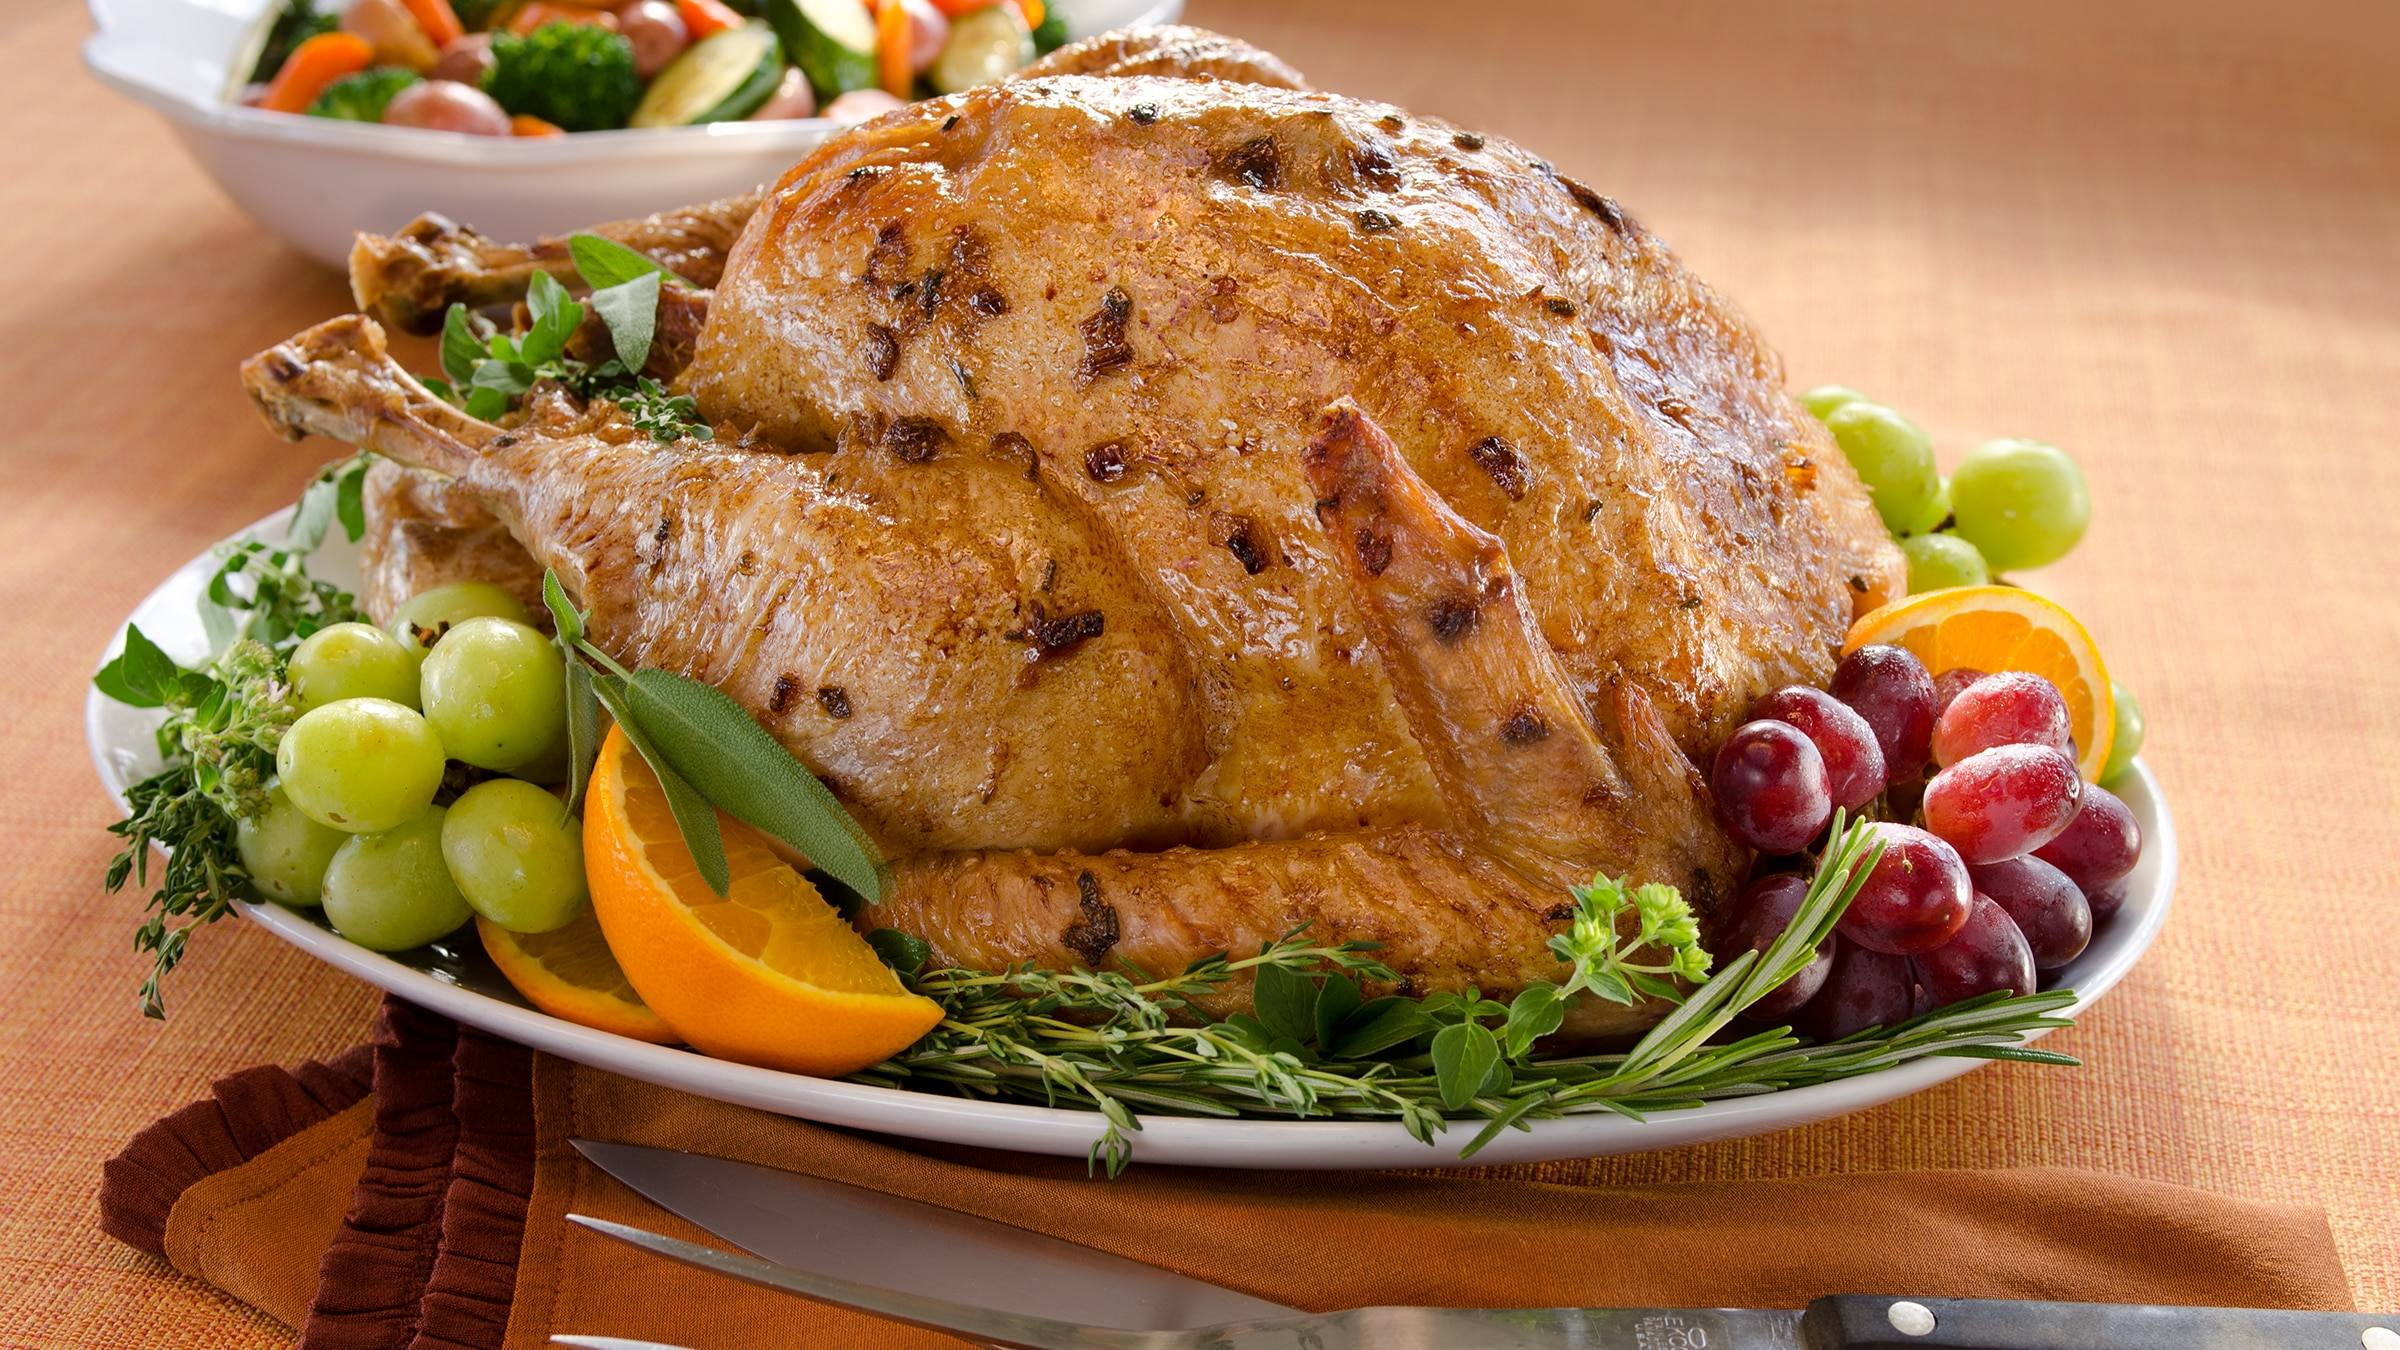 Whole Foods Prepared Turkey Gravy